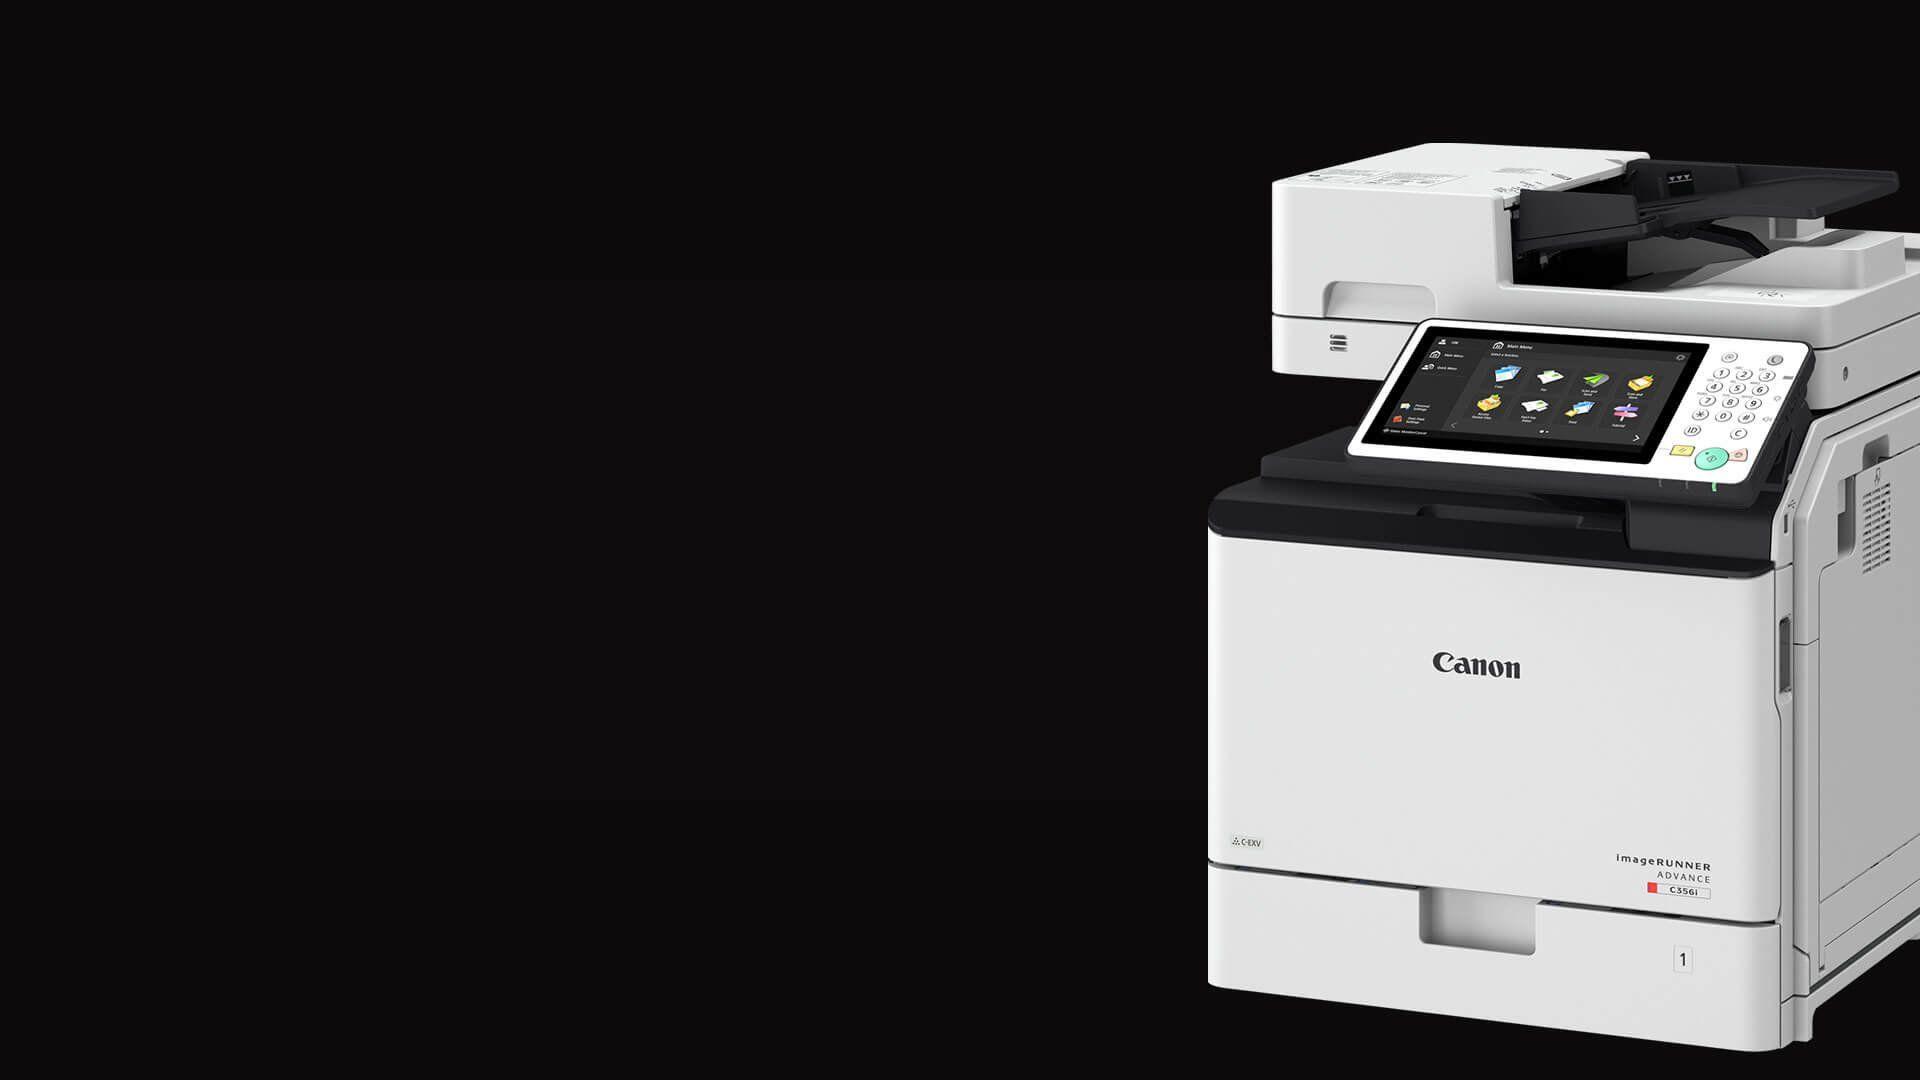 Canon ImageRUNNER ADVANCE C256/C356 Series